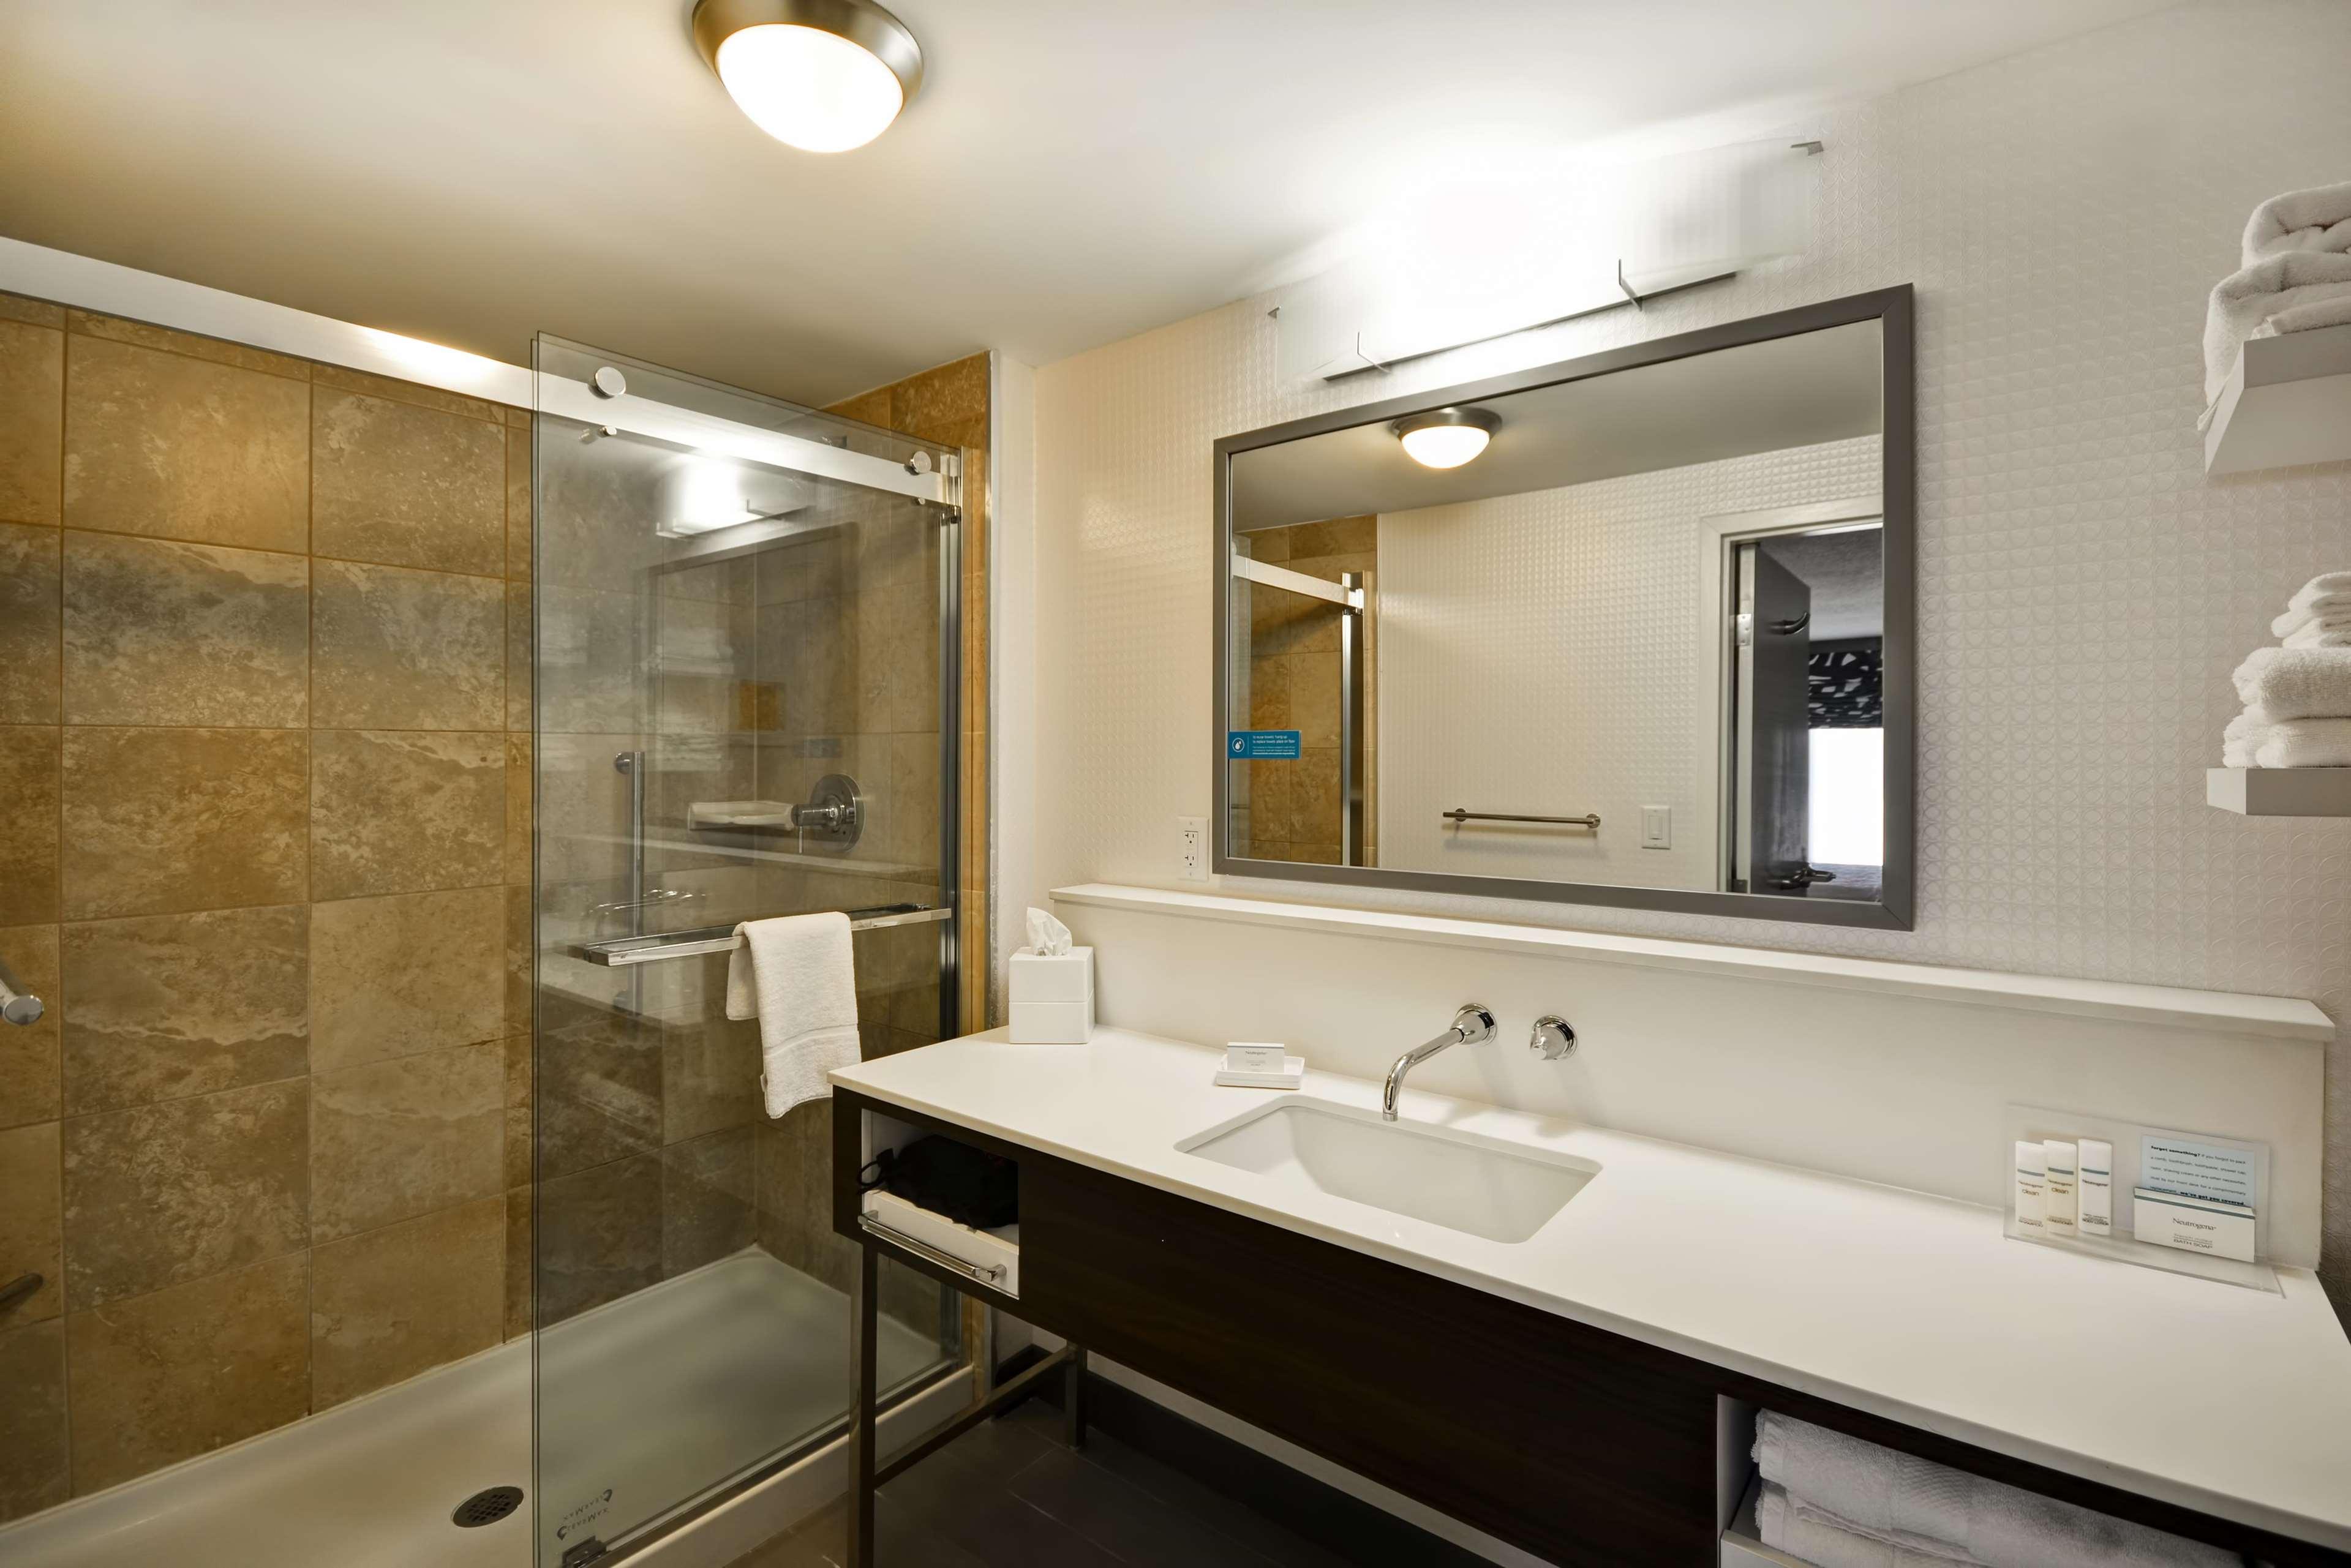 Hampton Inn & Suites Columbus-Easton Area image 42